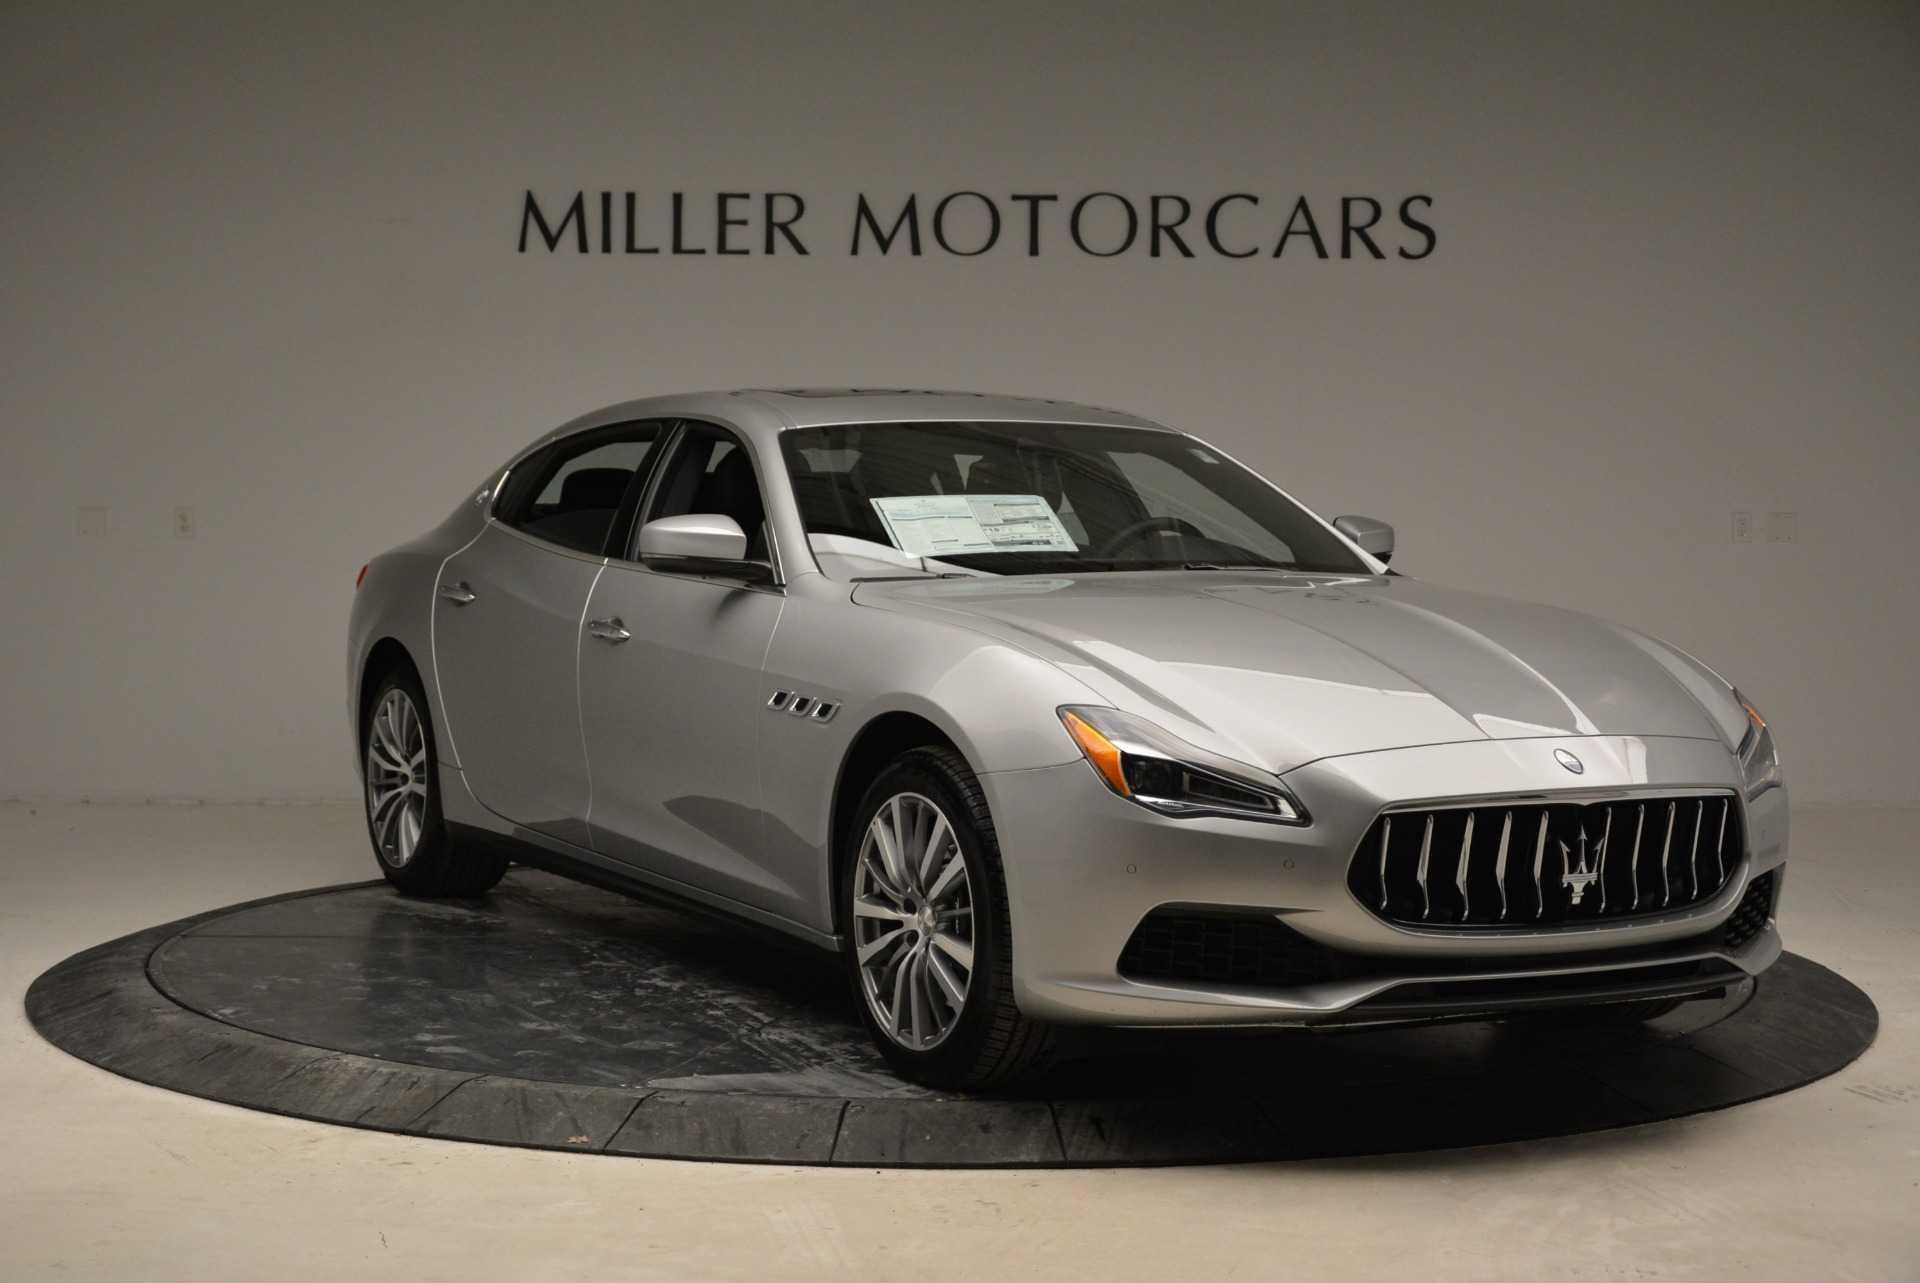 Maserati quattroporte 2020 года: цена, фото, тюнинг, отзывы